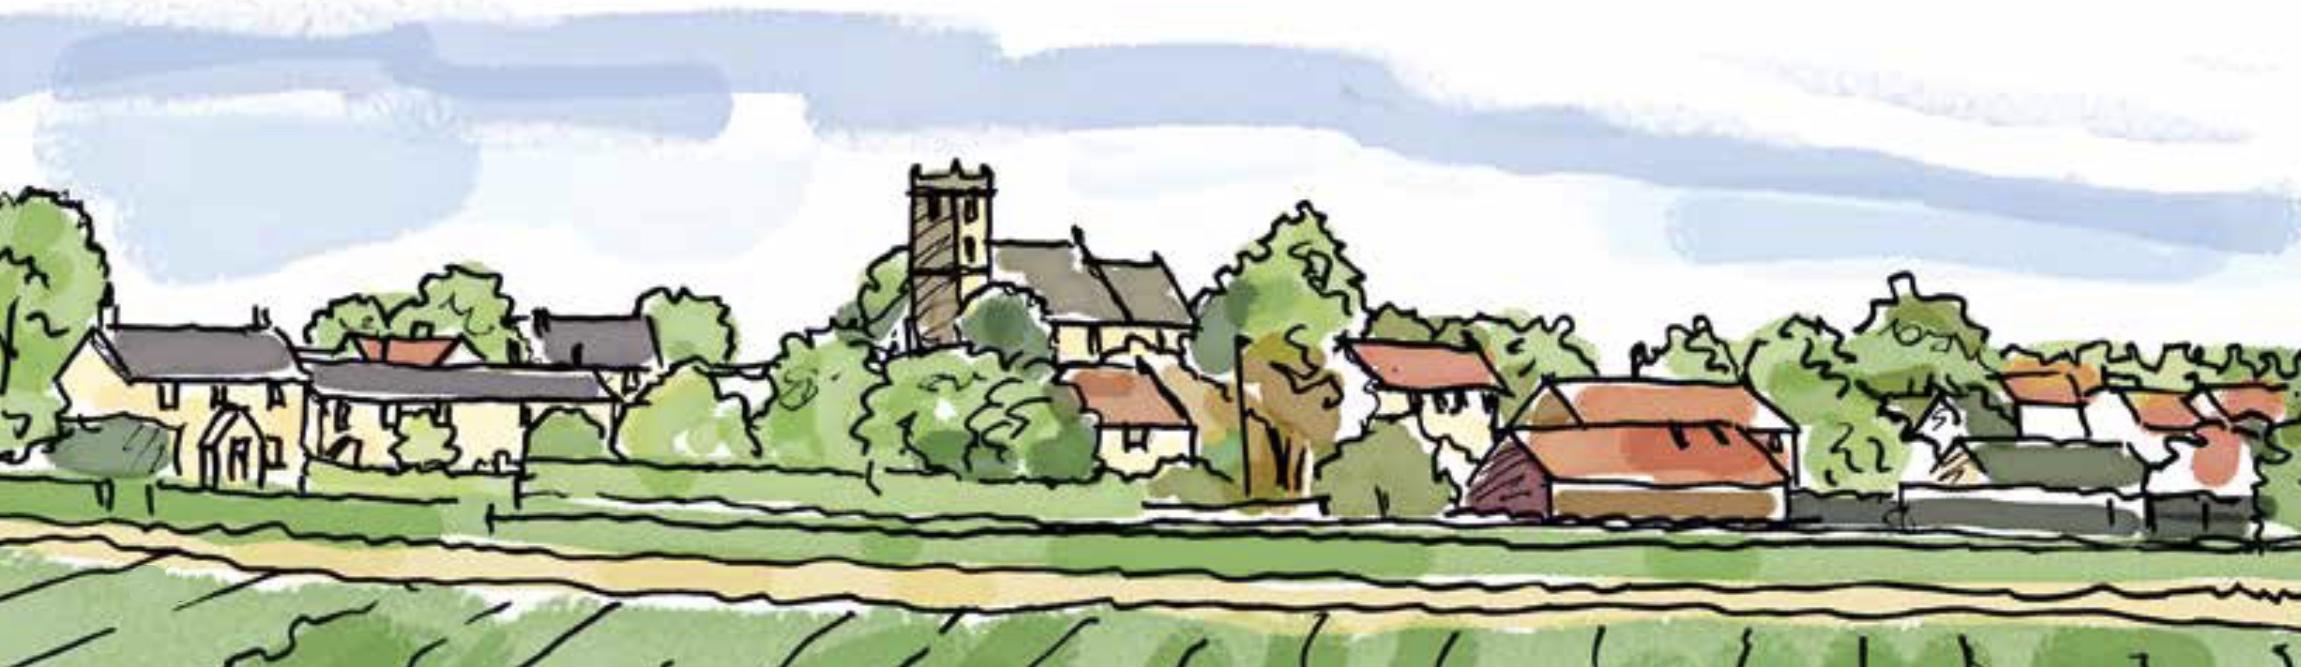 Walton Village an artists impression